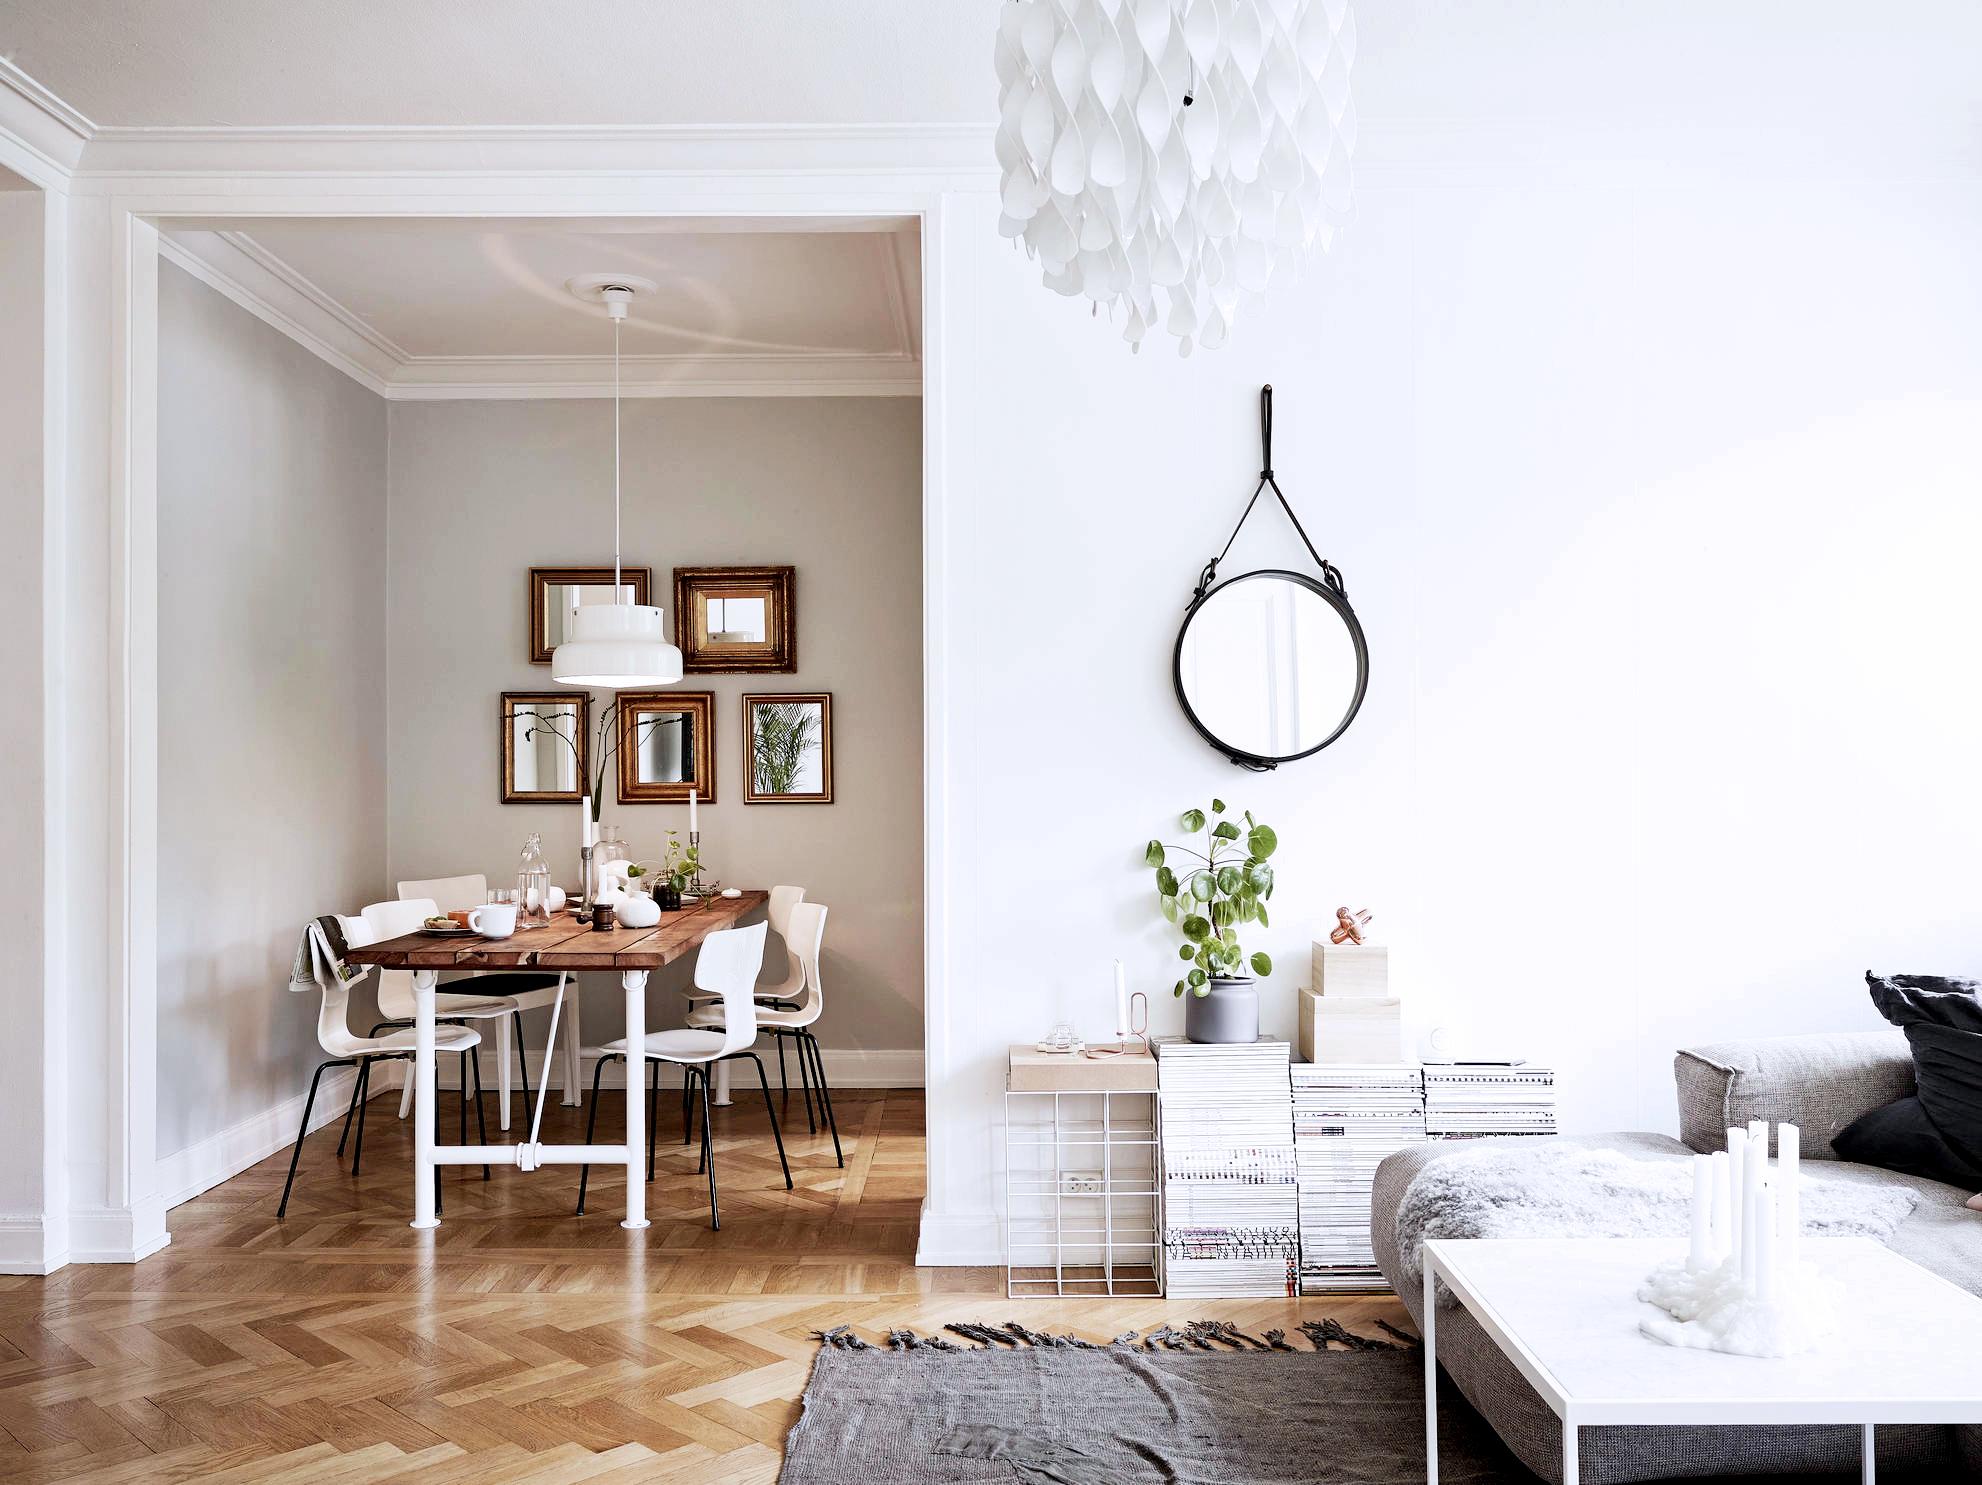 Jelanie blog - Small Scandinavian home 3